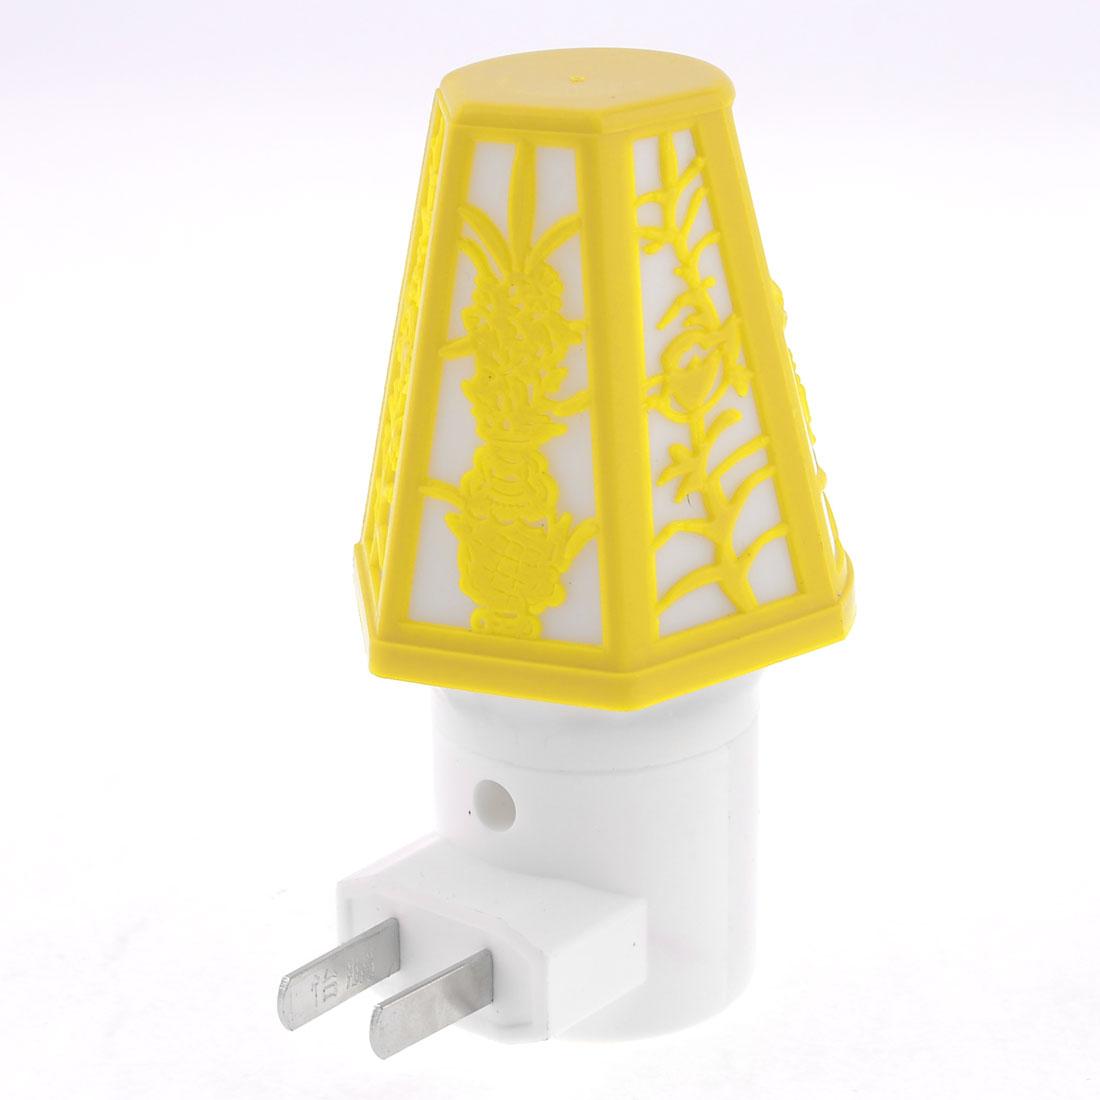 AC 110-250V US Plug Fish Embossment Warm White Light Bedside Night Lamp